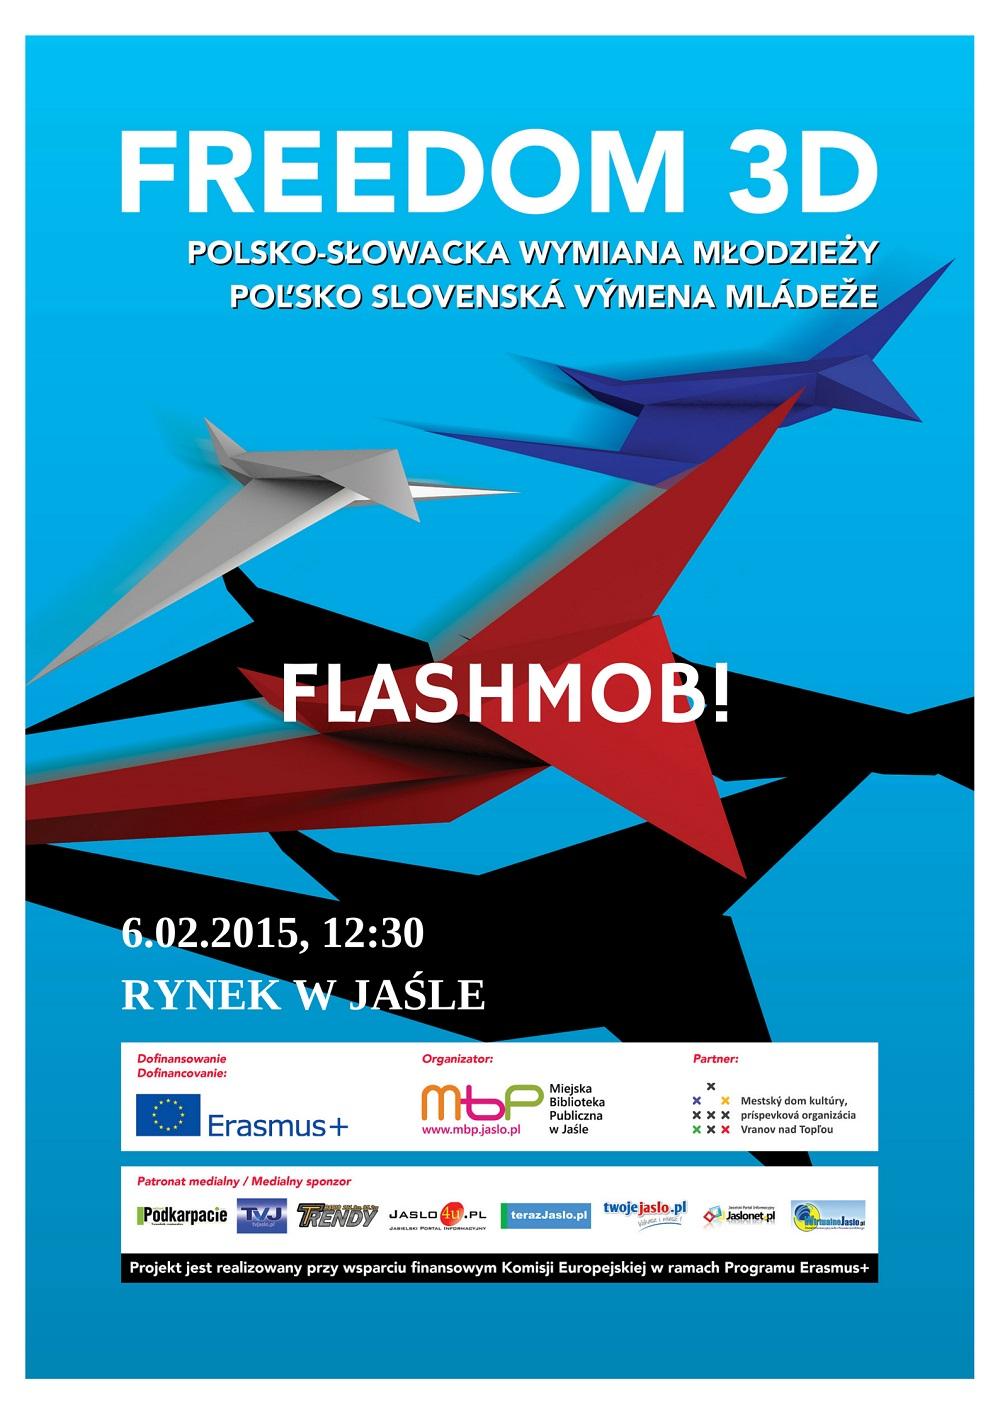 FLASHMOB_freedom